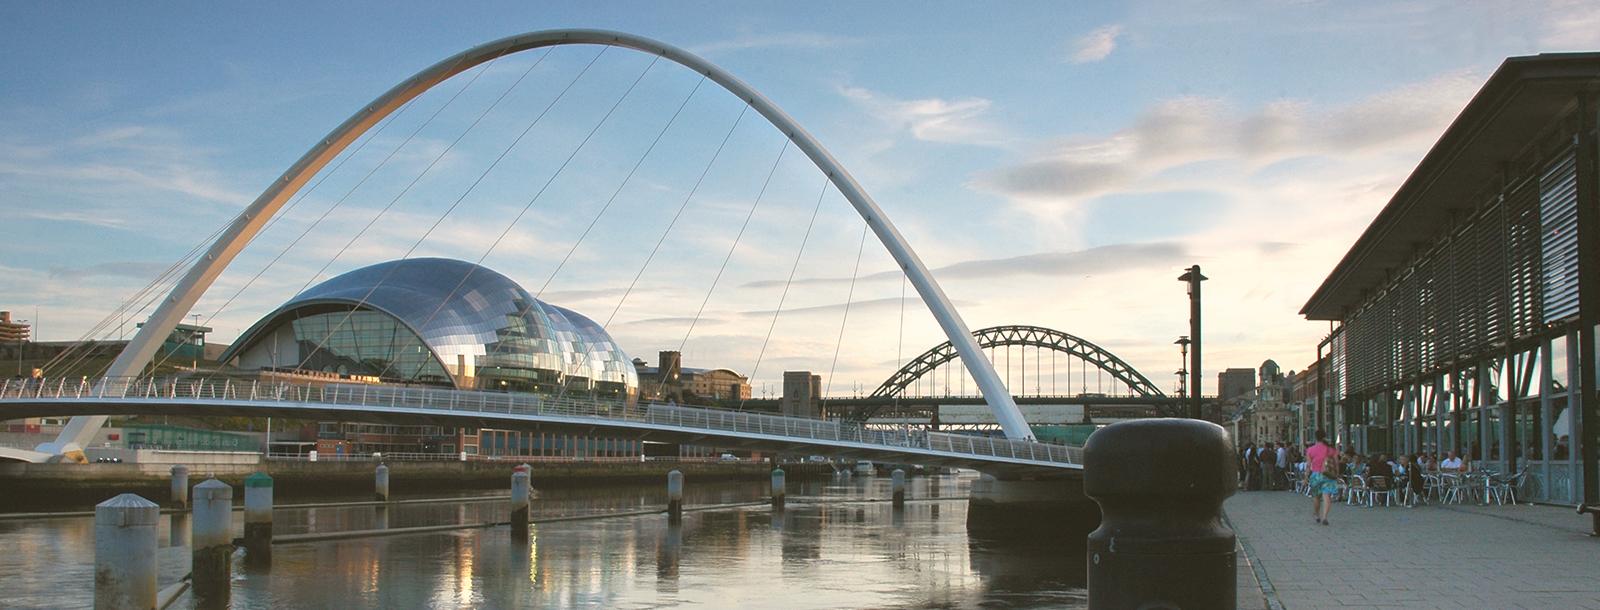 Hillsong Newcastle, UK,